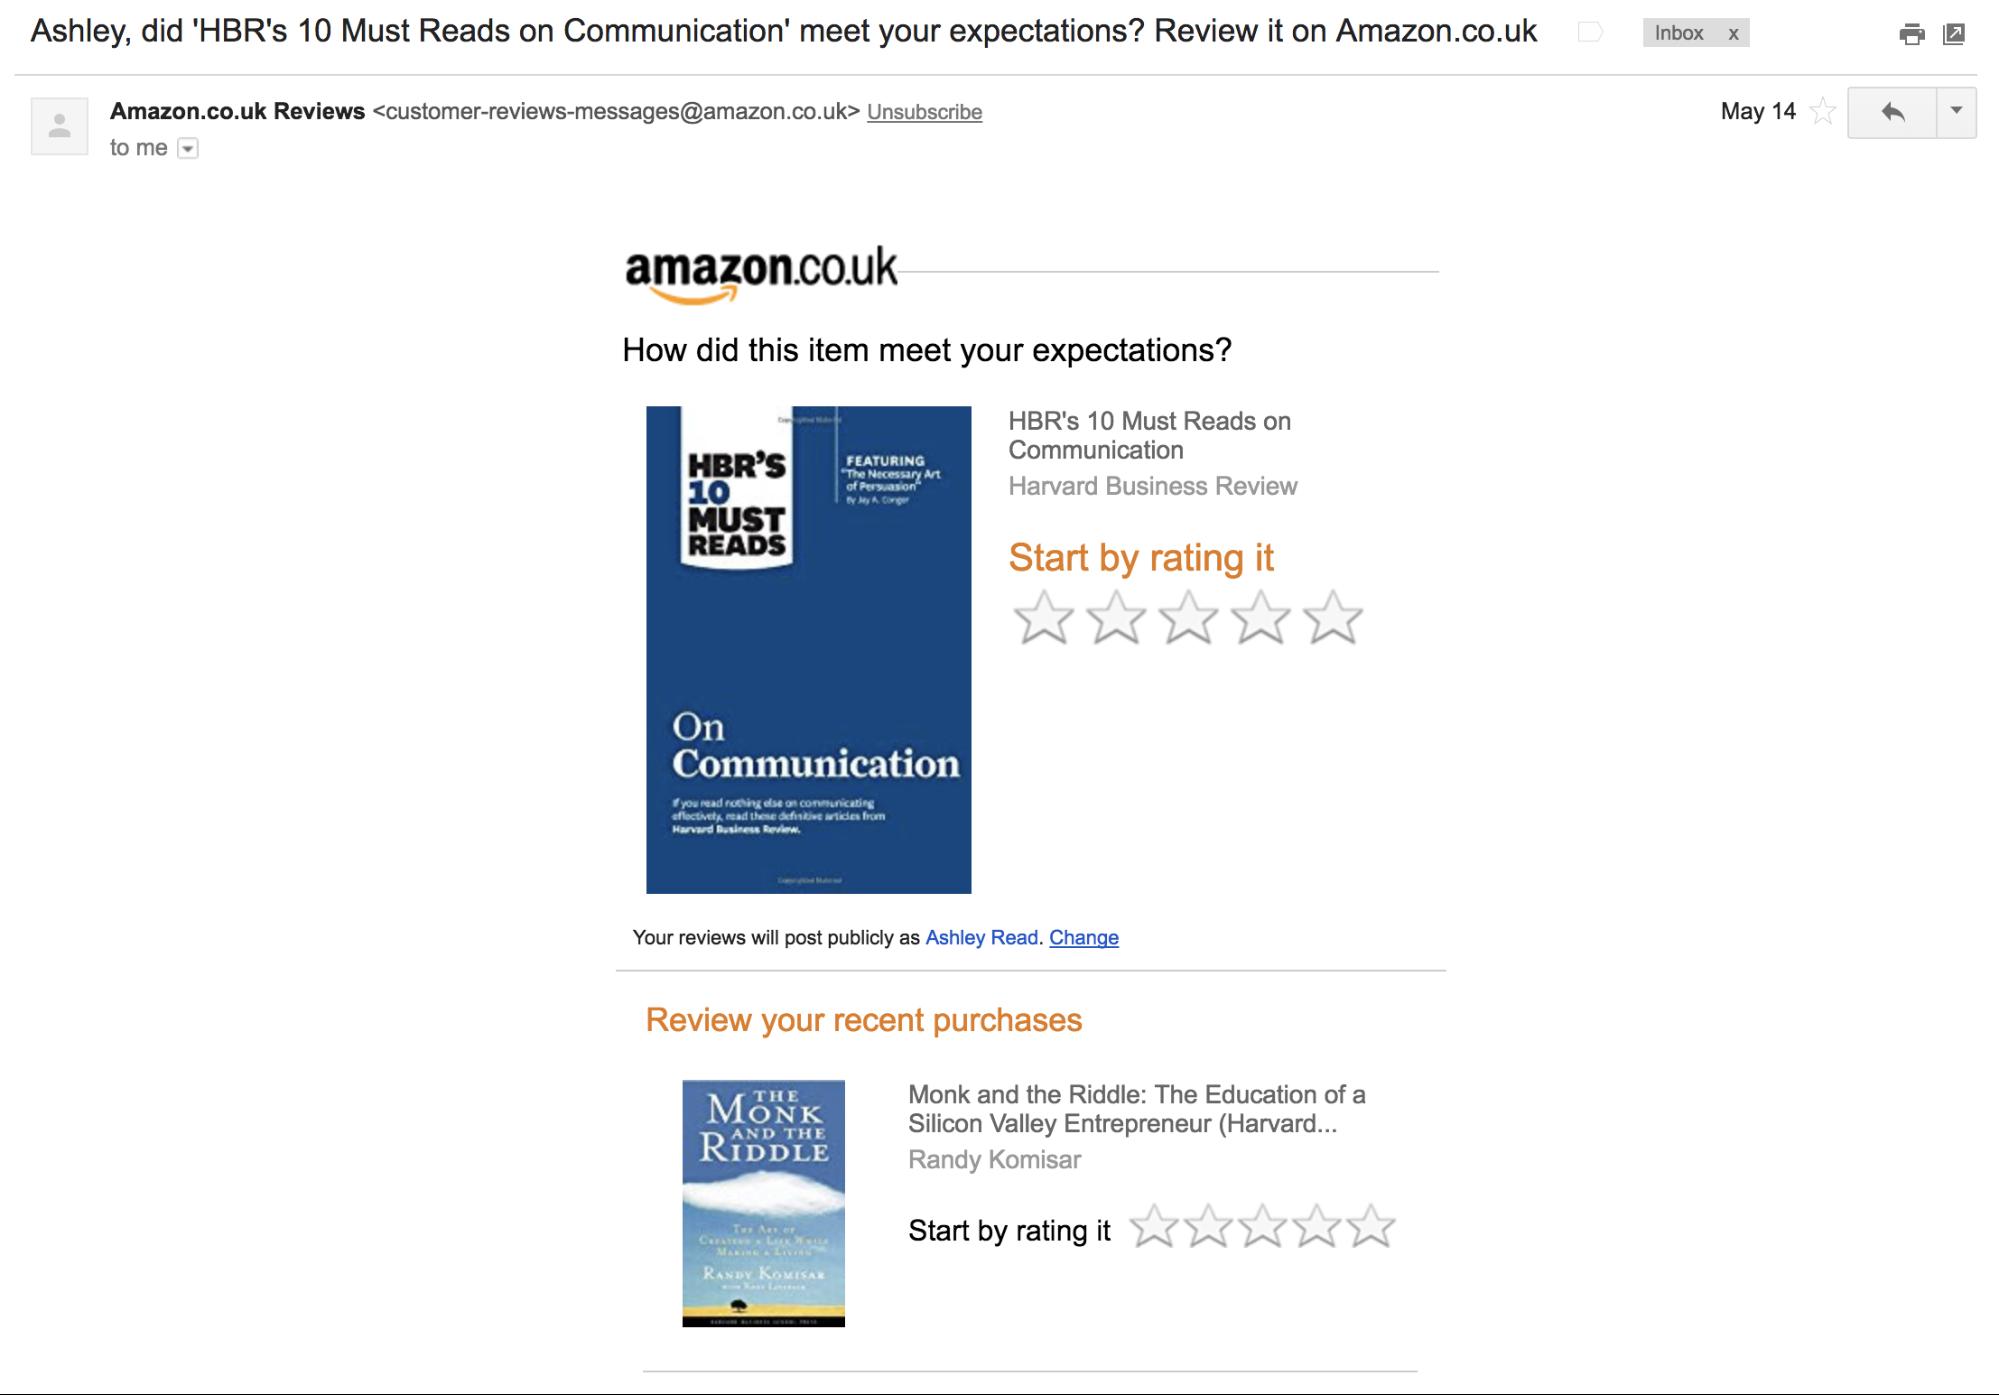 Screenshot showing an email by amazon.co.uk